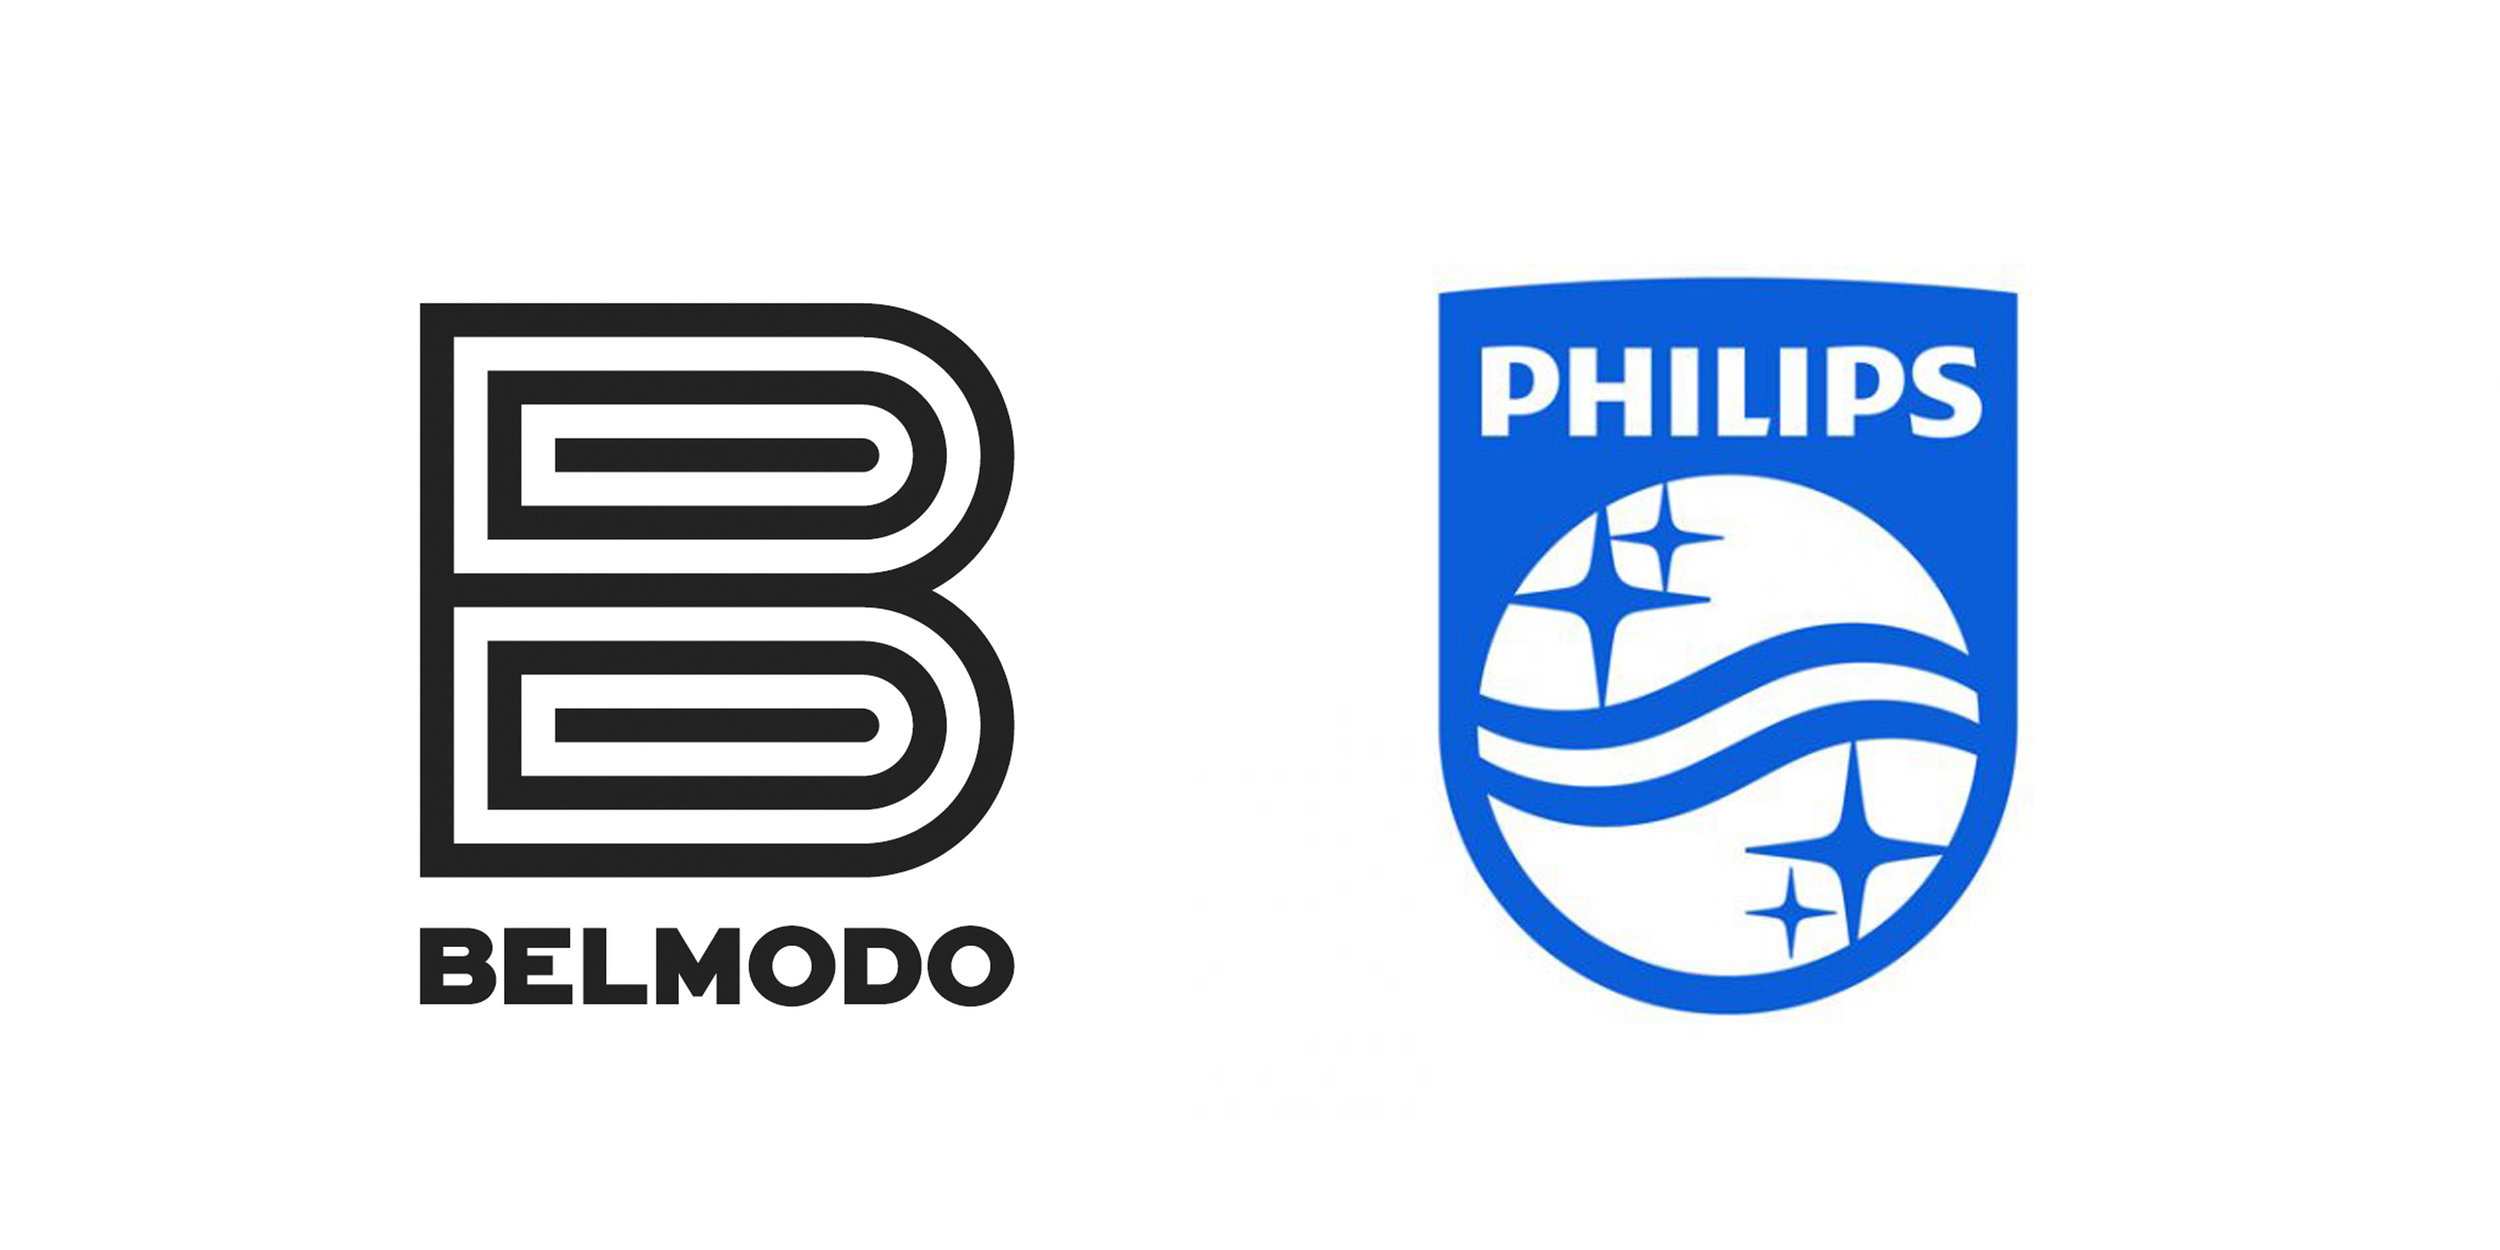 Belmodo_Philips_Logos.jpg